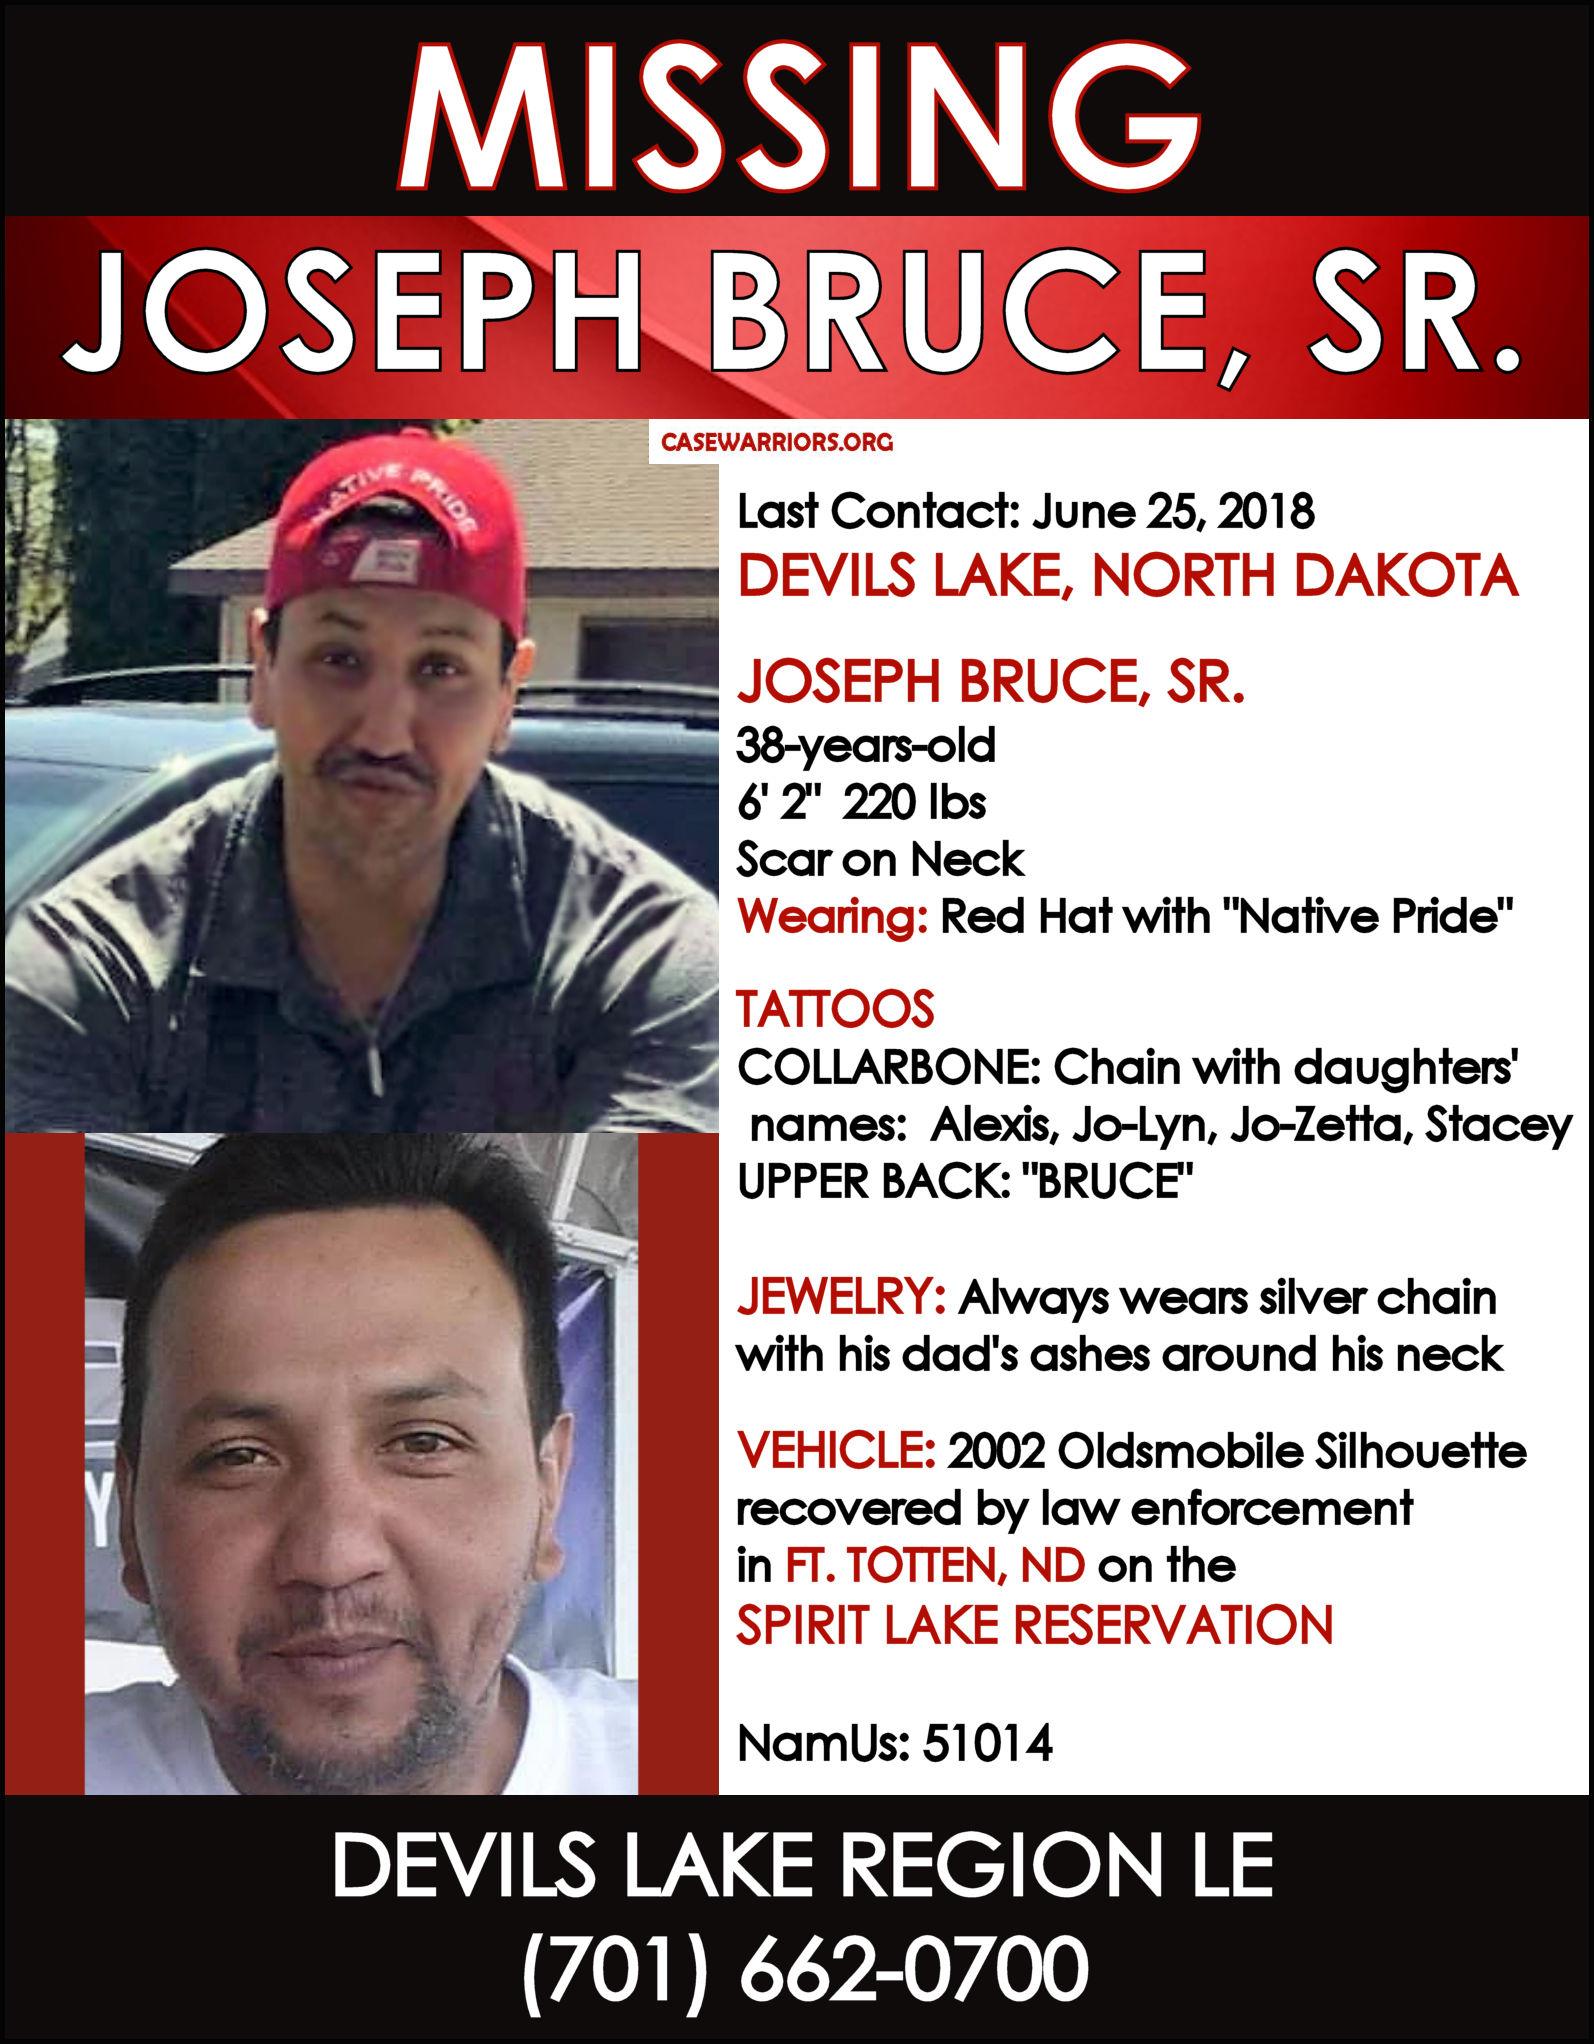 JOSEPH BRUCE, SR.